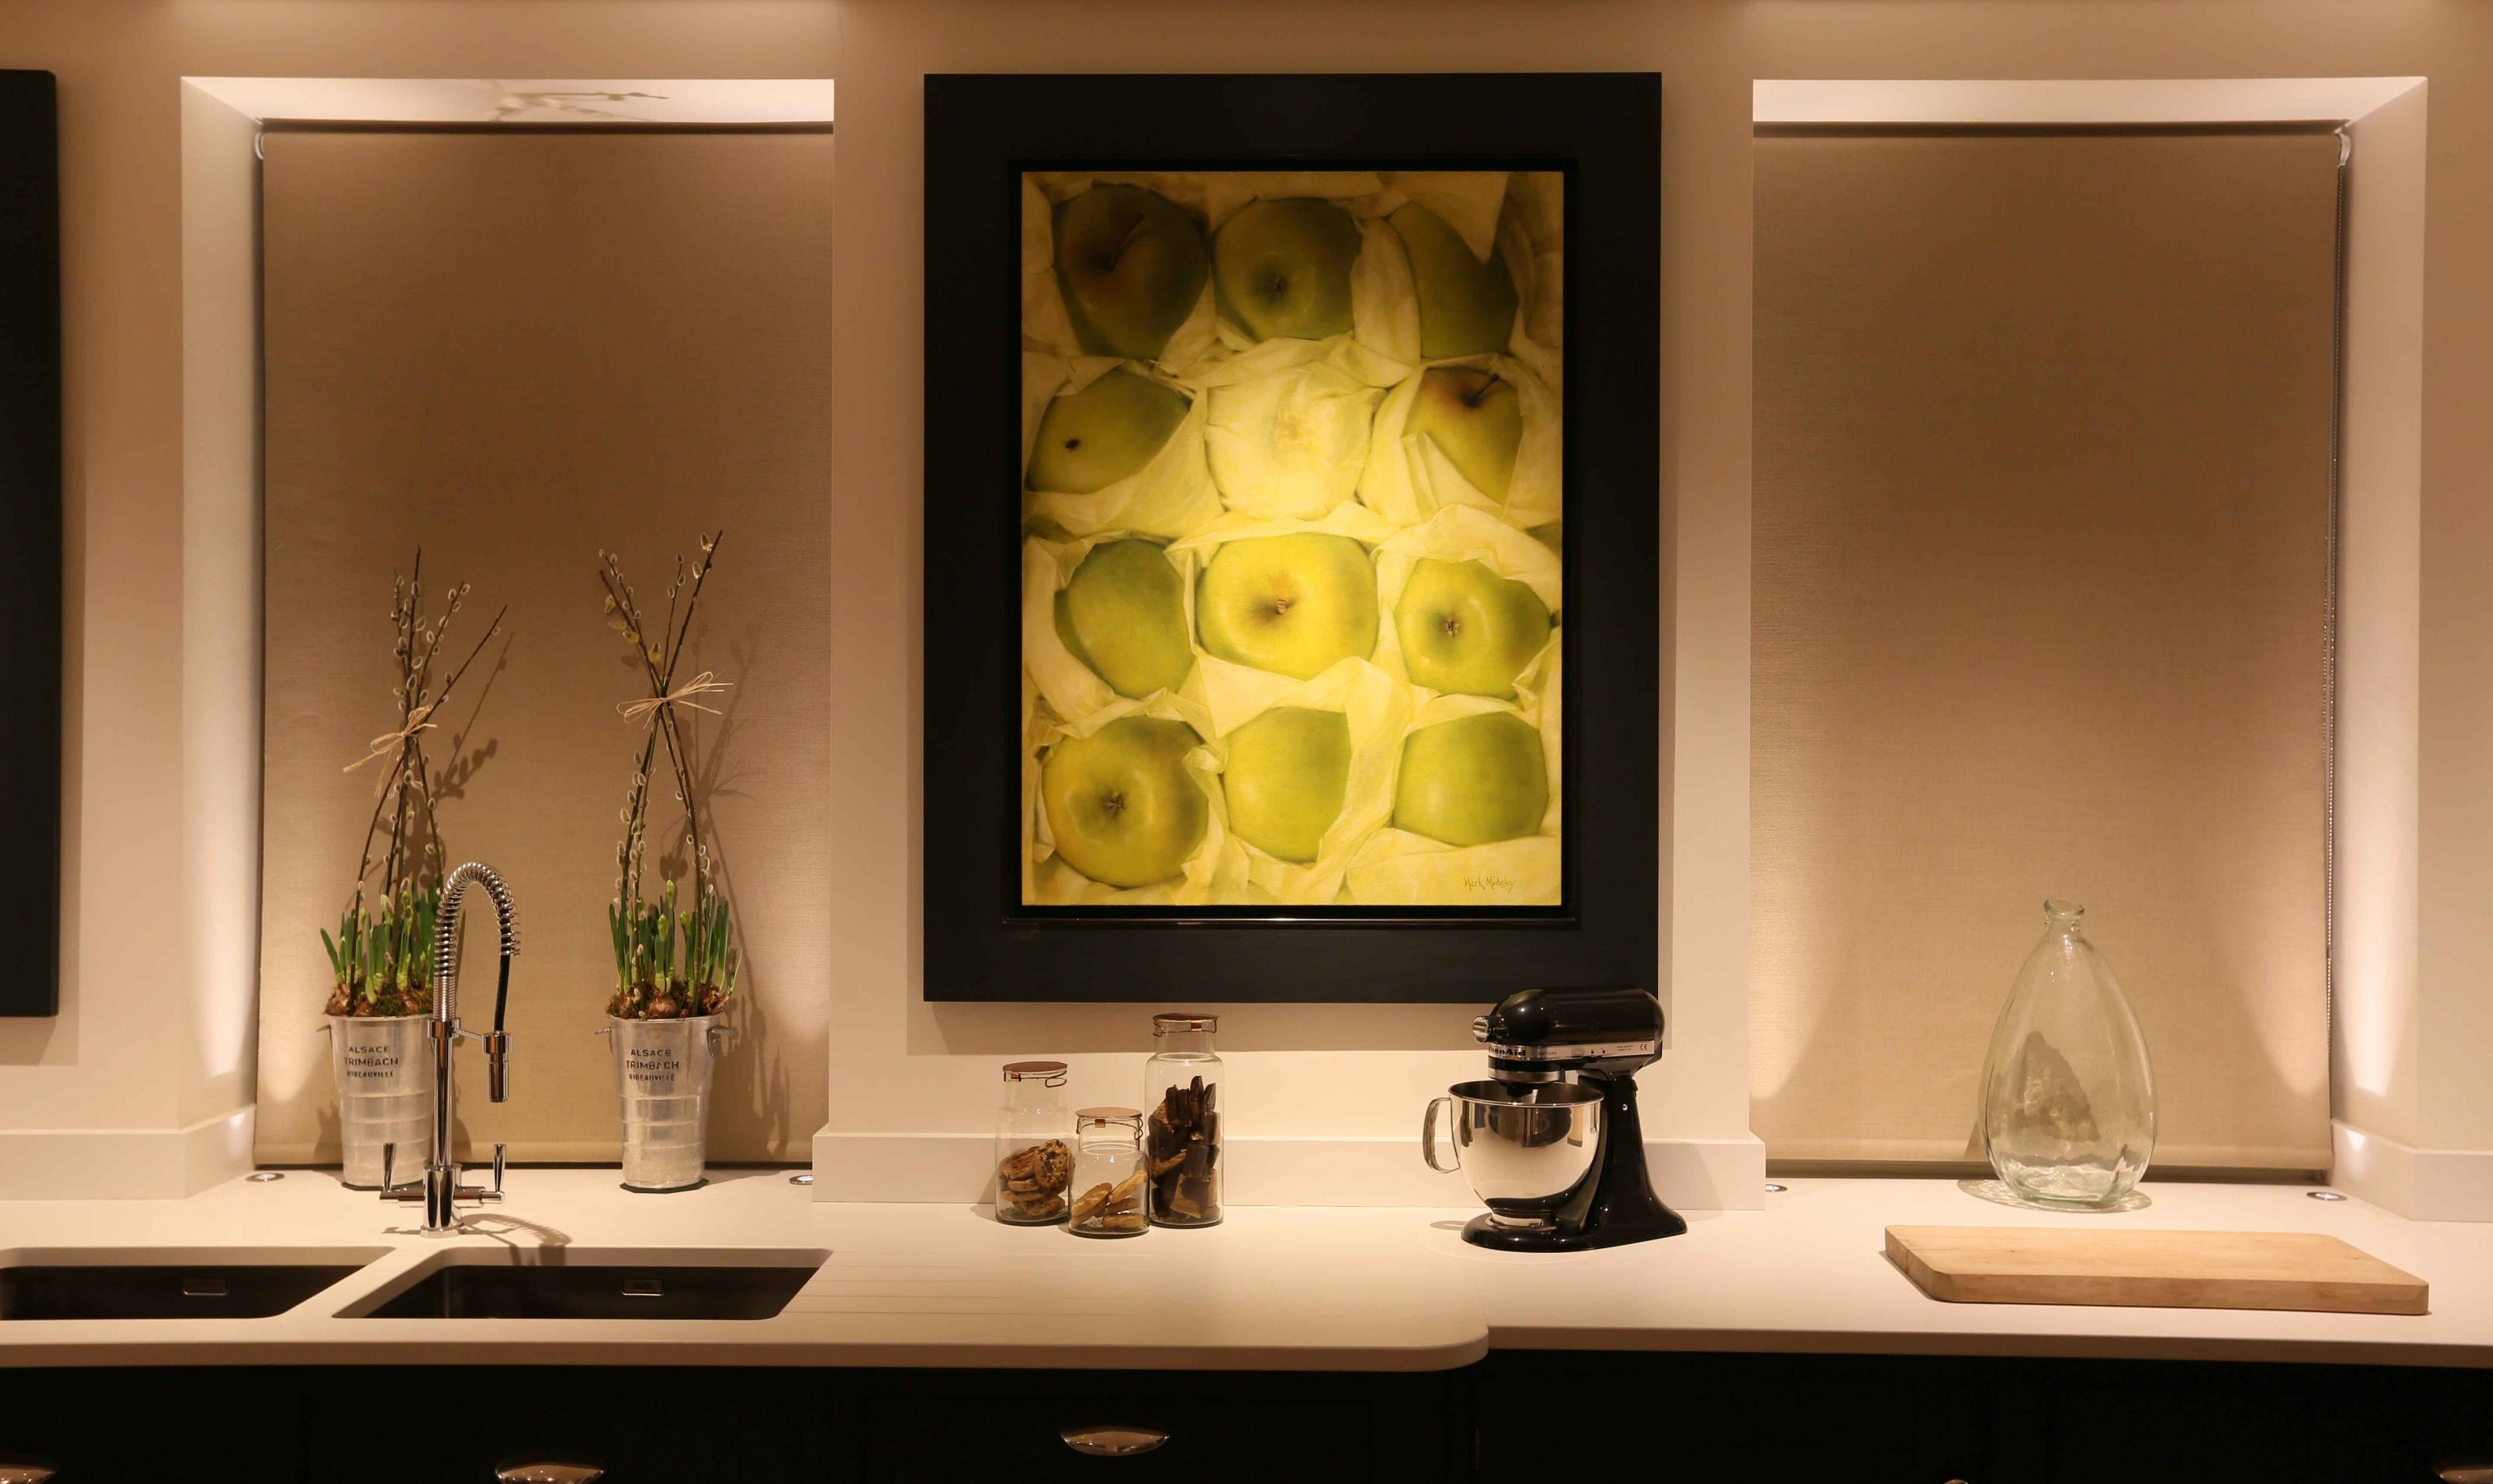 Kitchen Window and Art Lighting